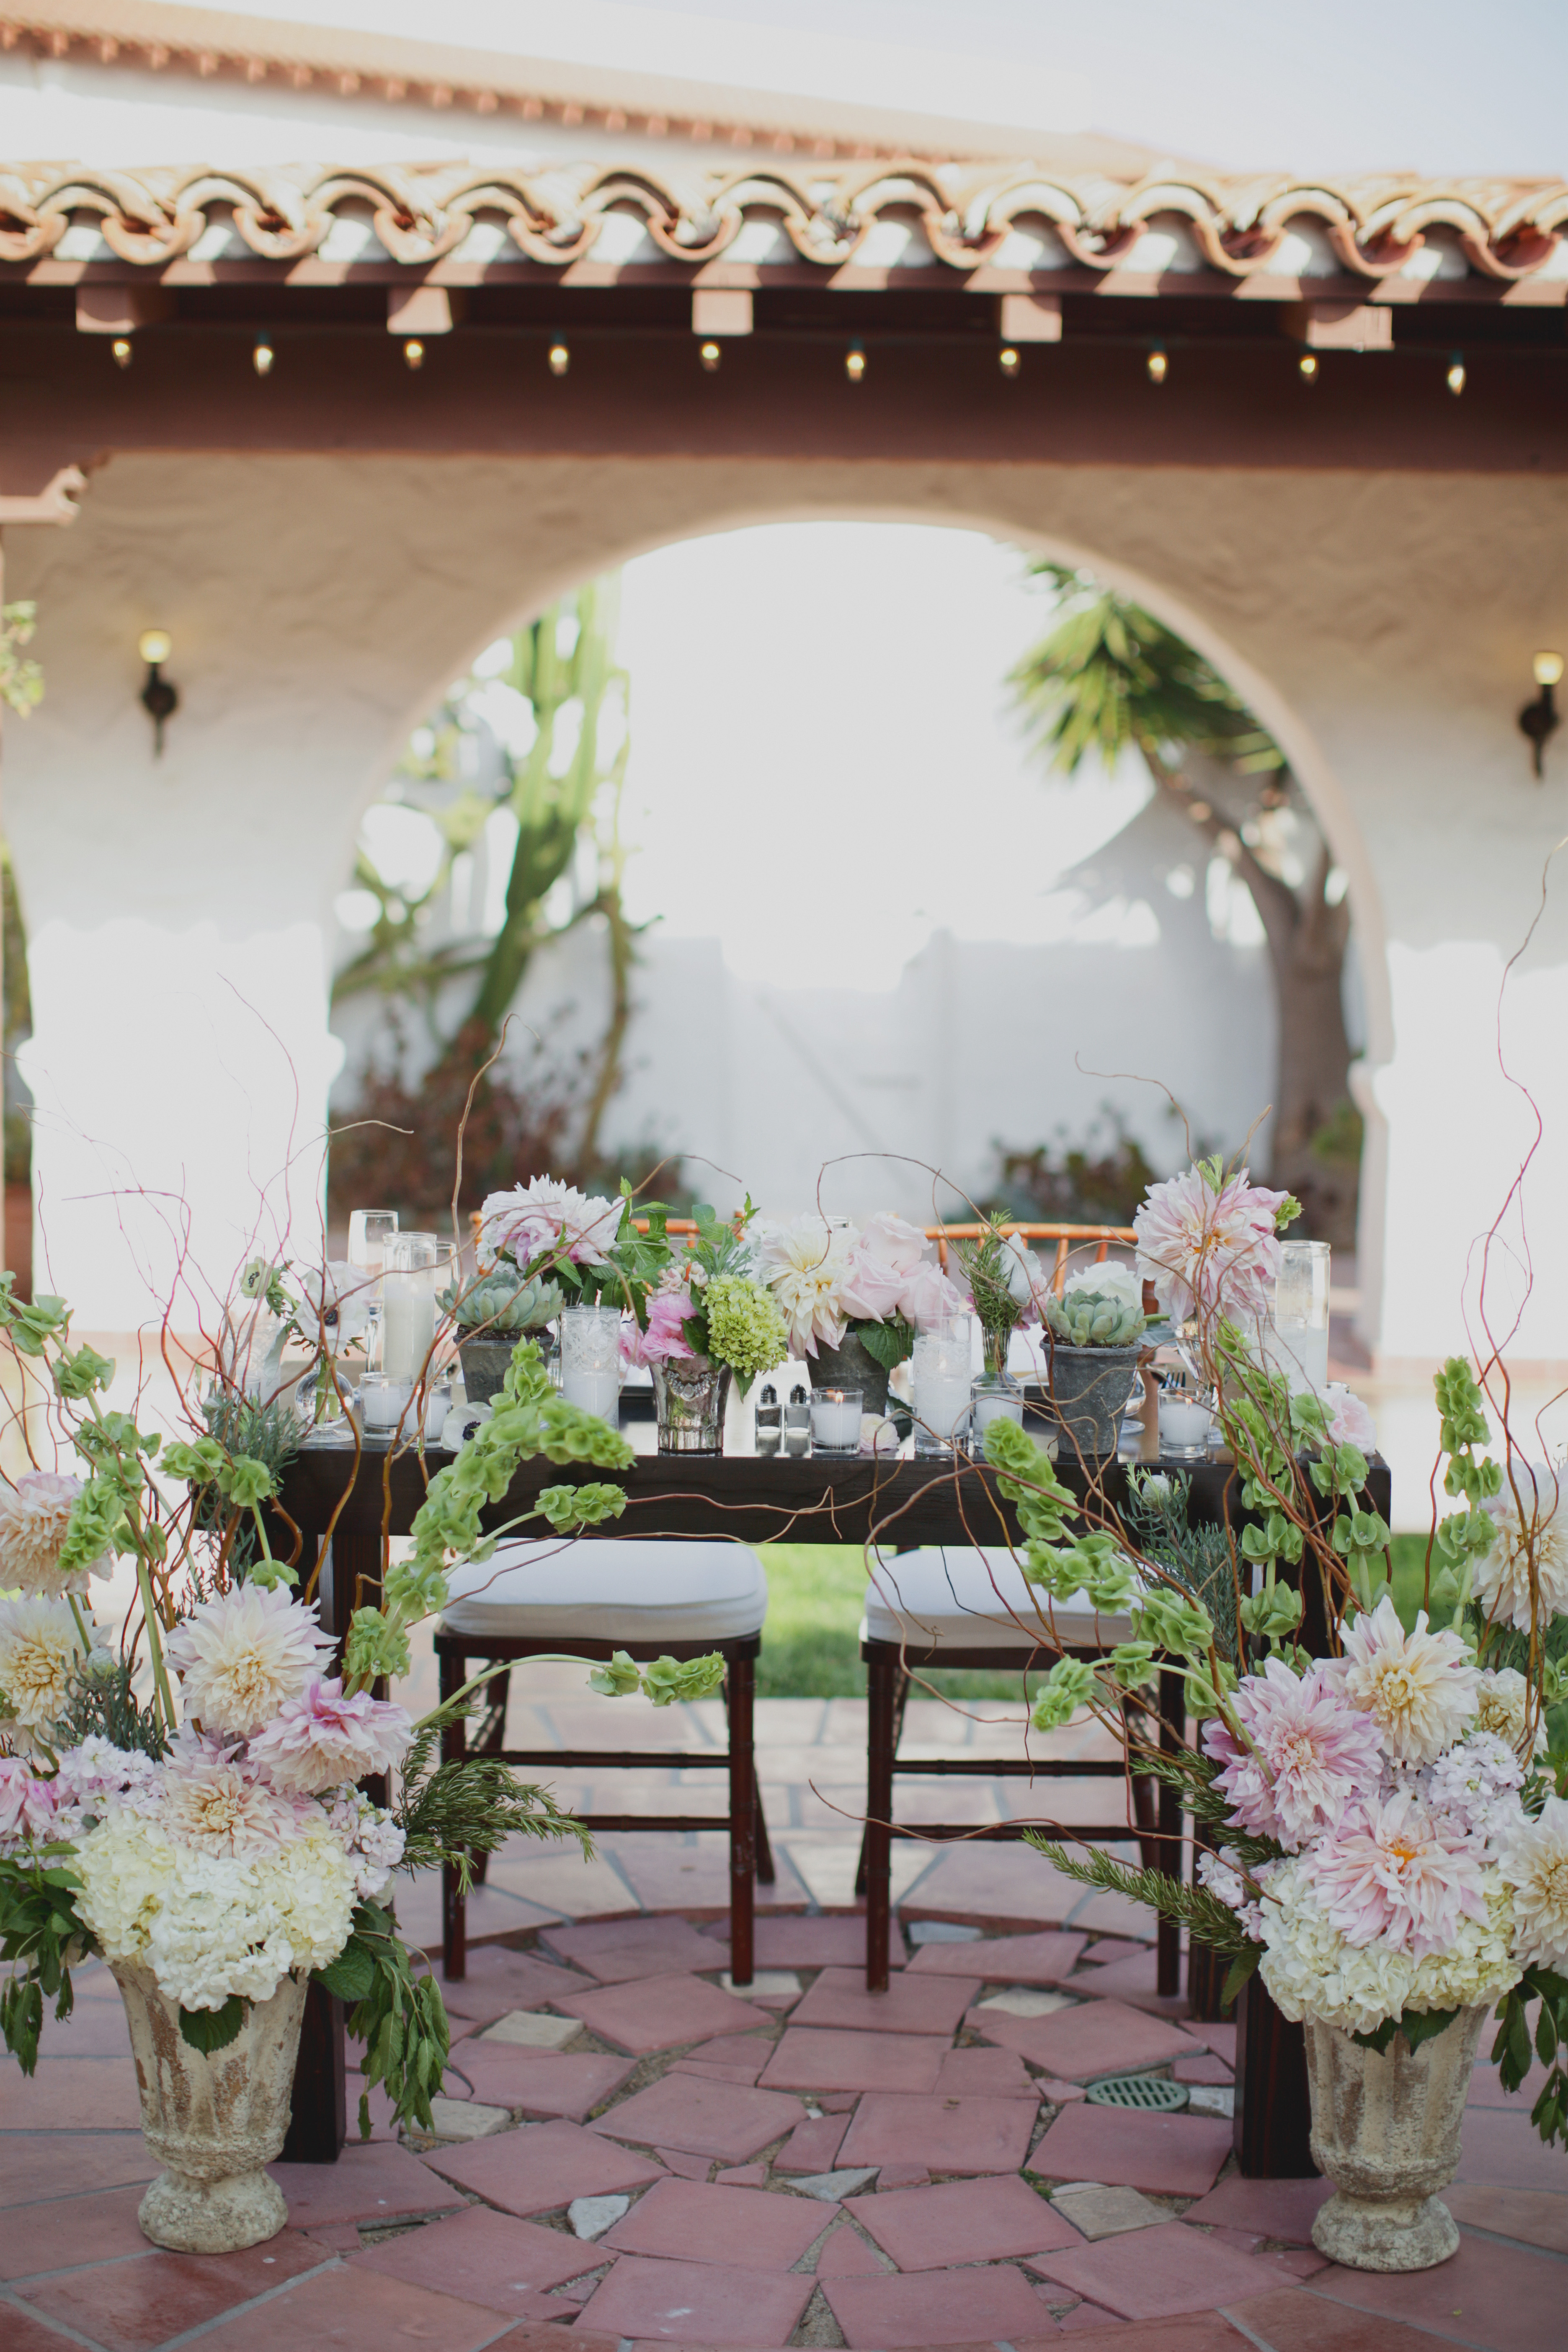 Casa Romantica wedding, San Clemente wedding planner, Outdoor Spanish wedding venue